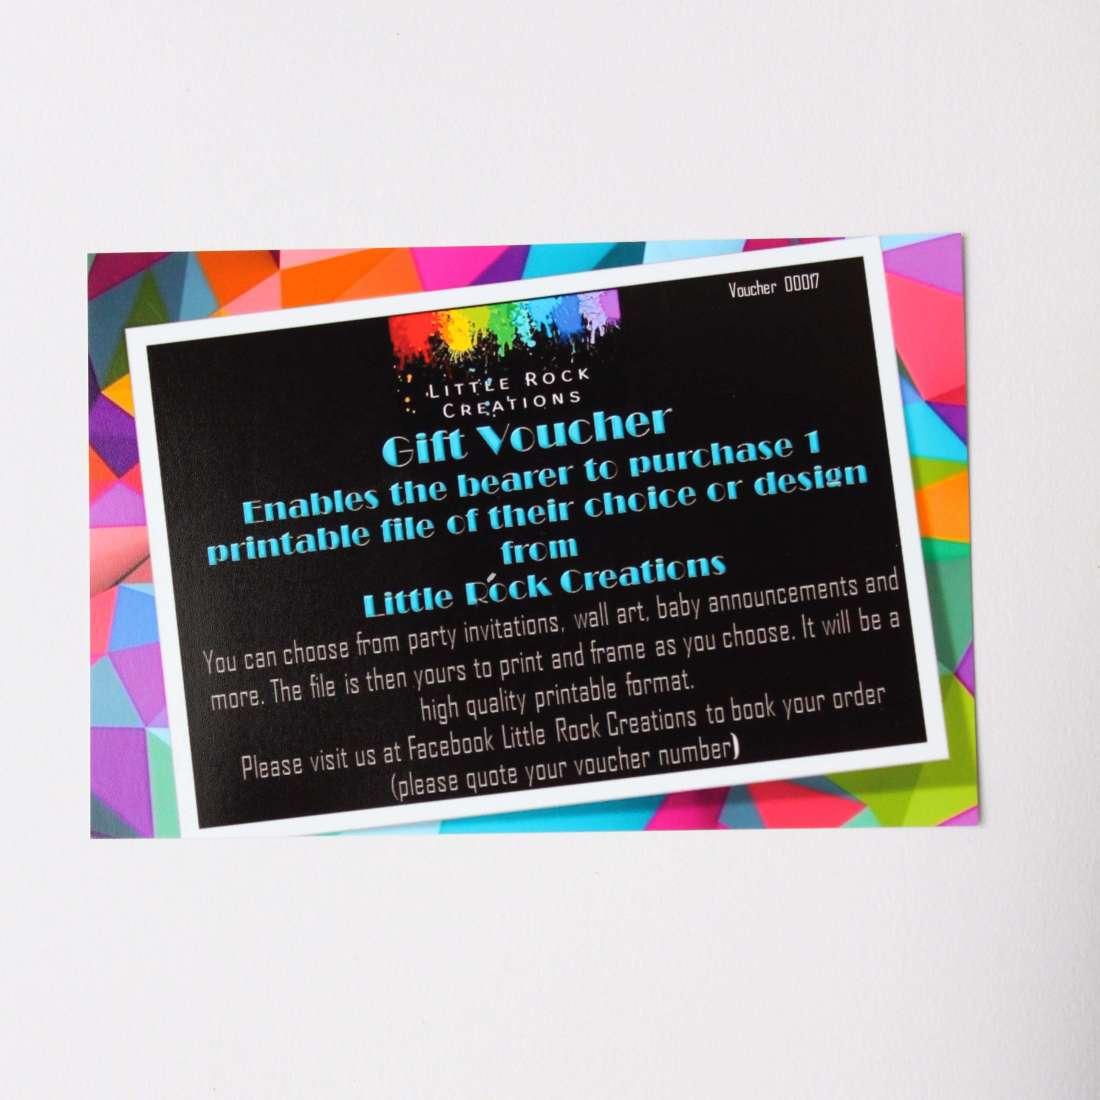 Little Rock Creations - Digital file voucher